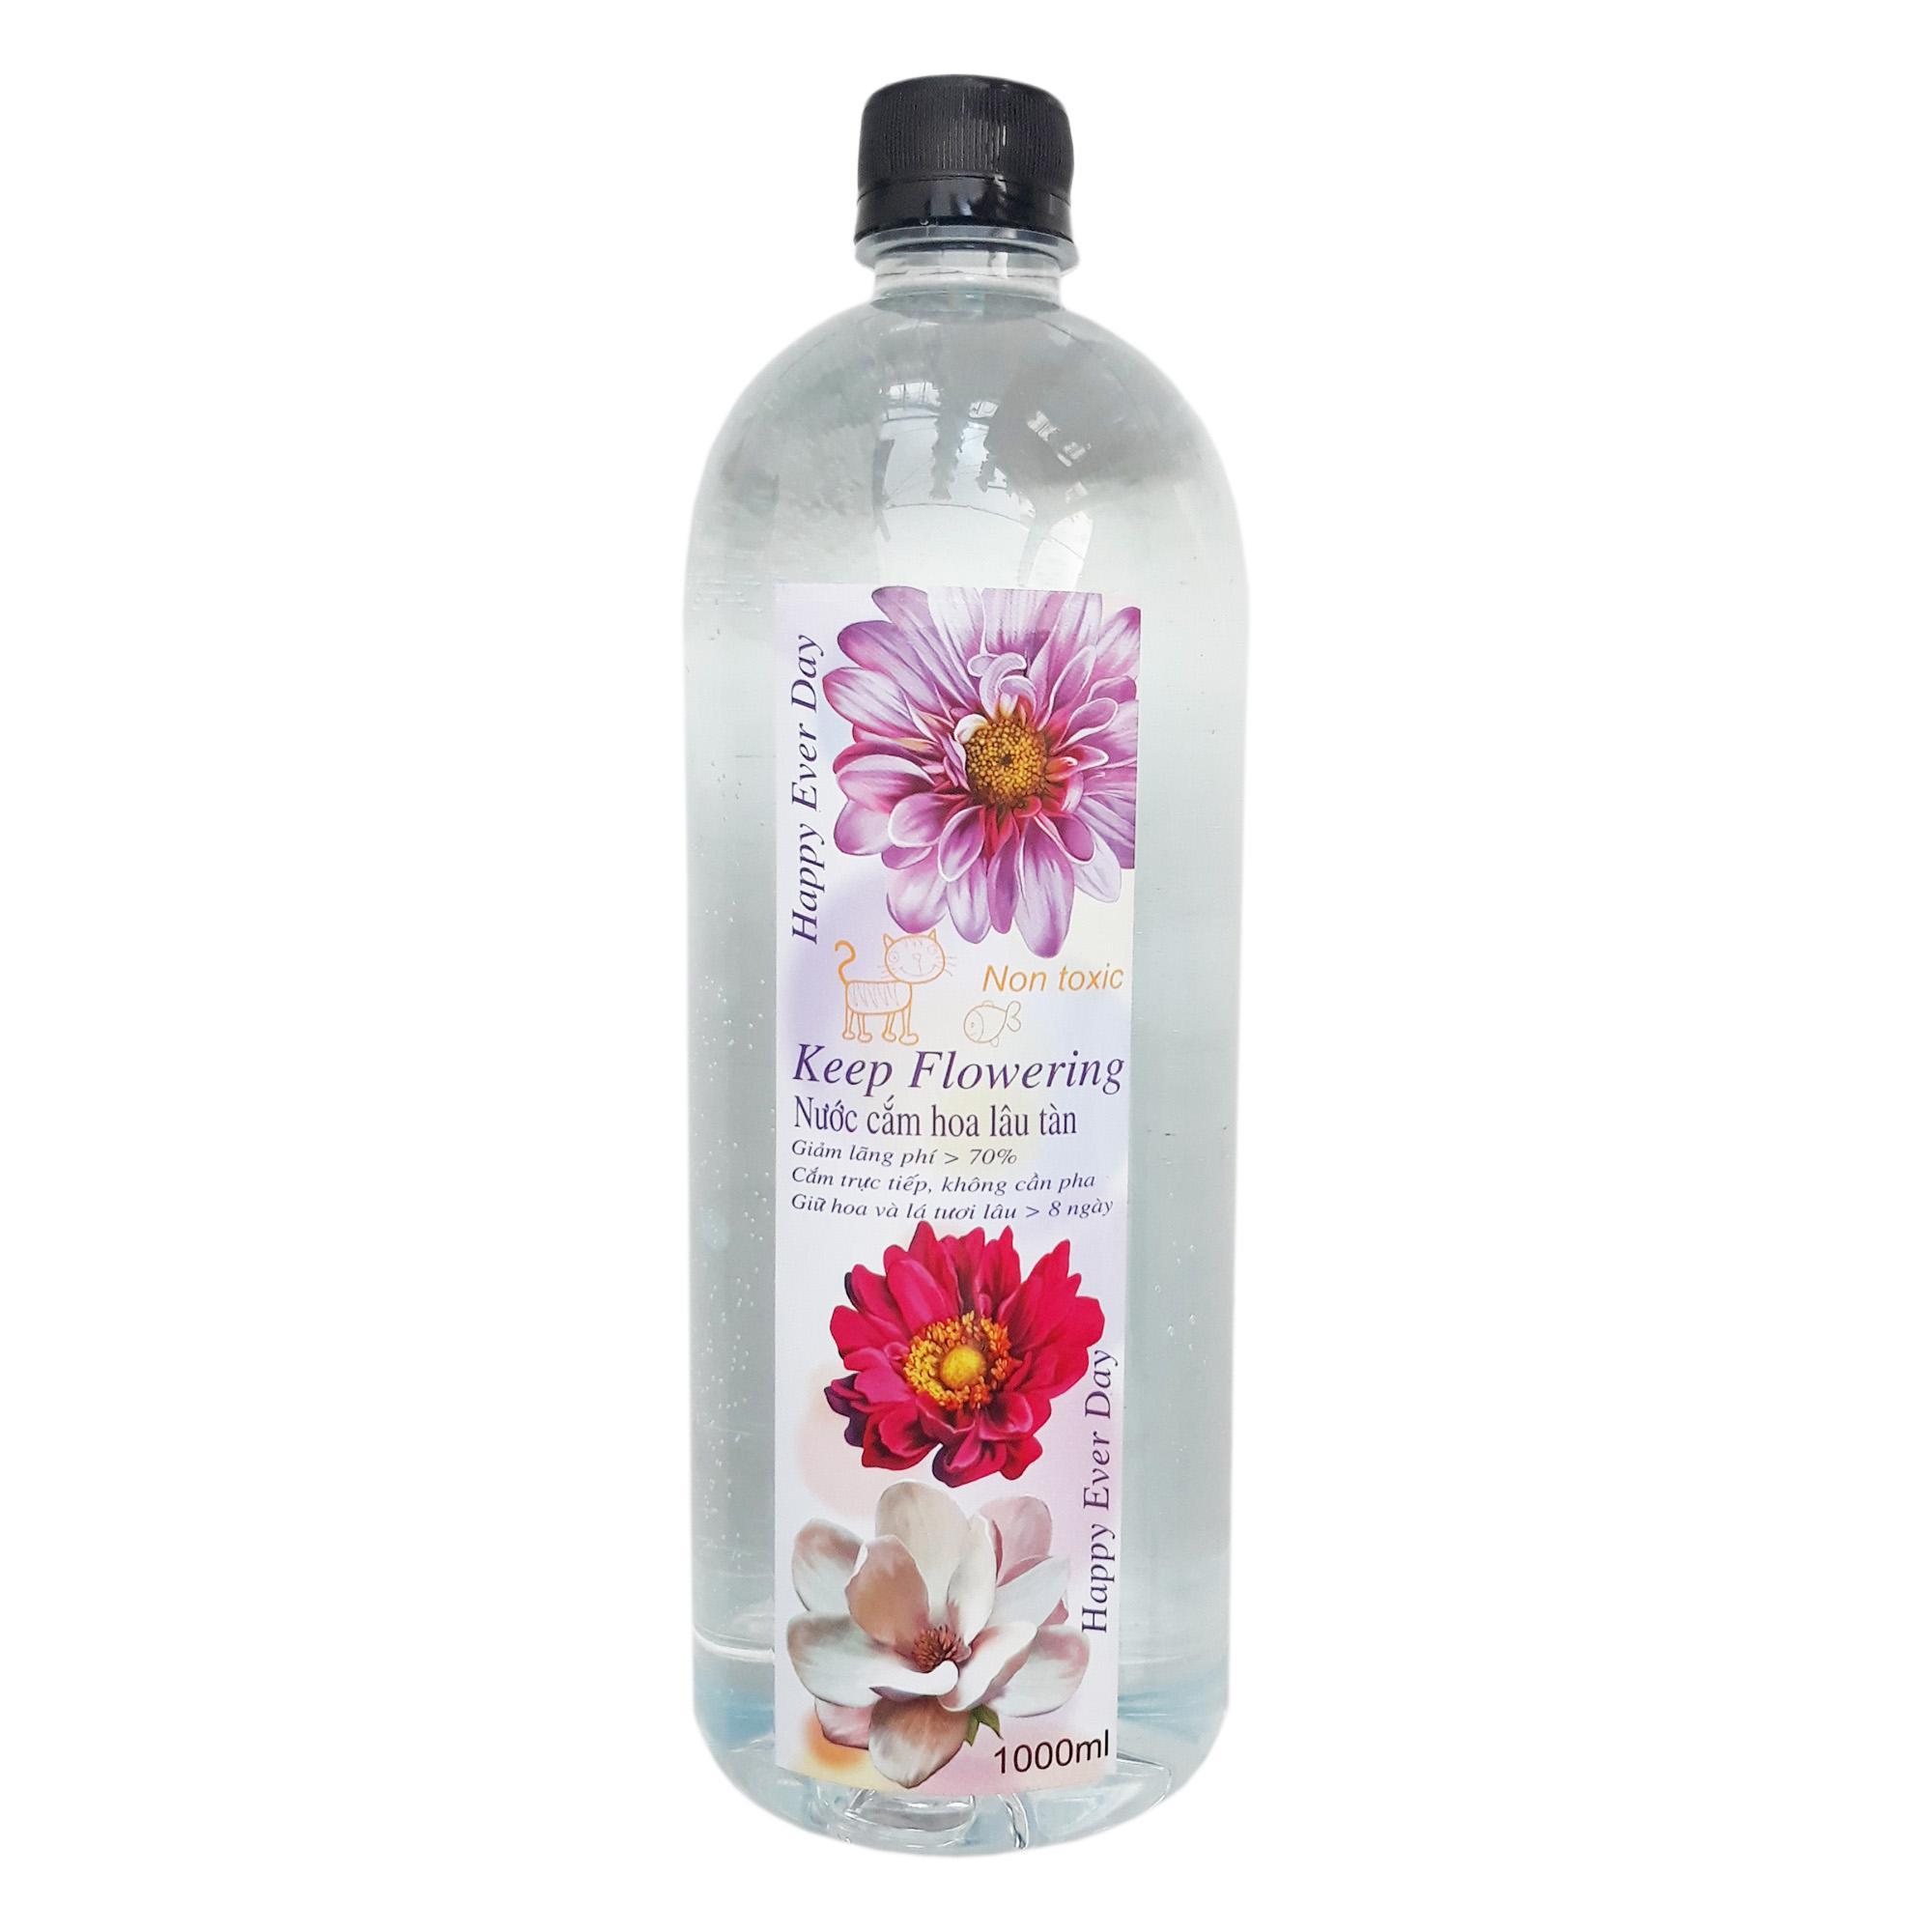 Nước cắm hoa KEEP FLOWERING 1000ml- Giữ hoa tươi lâu